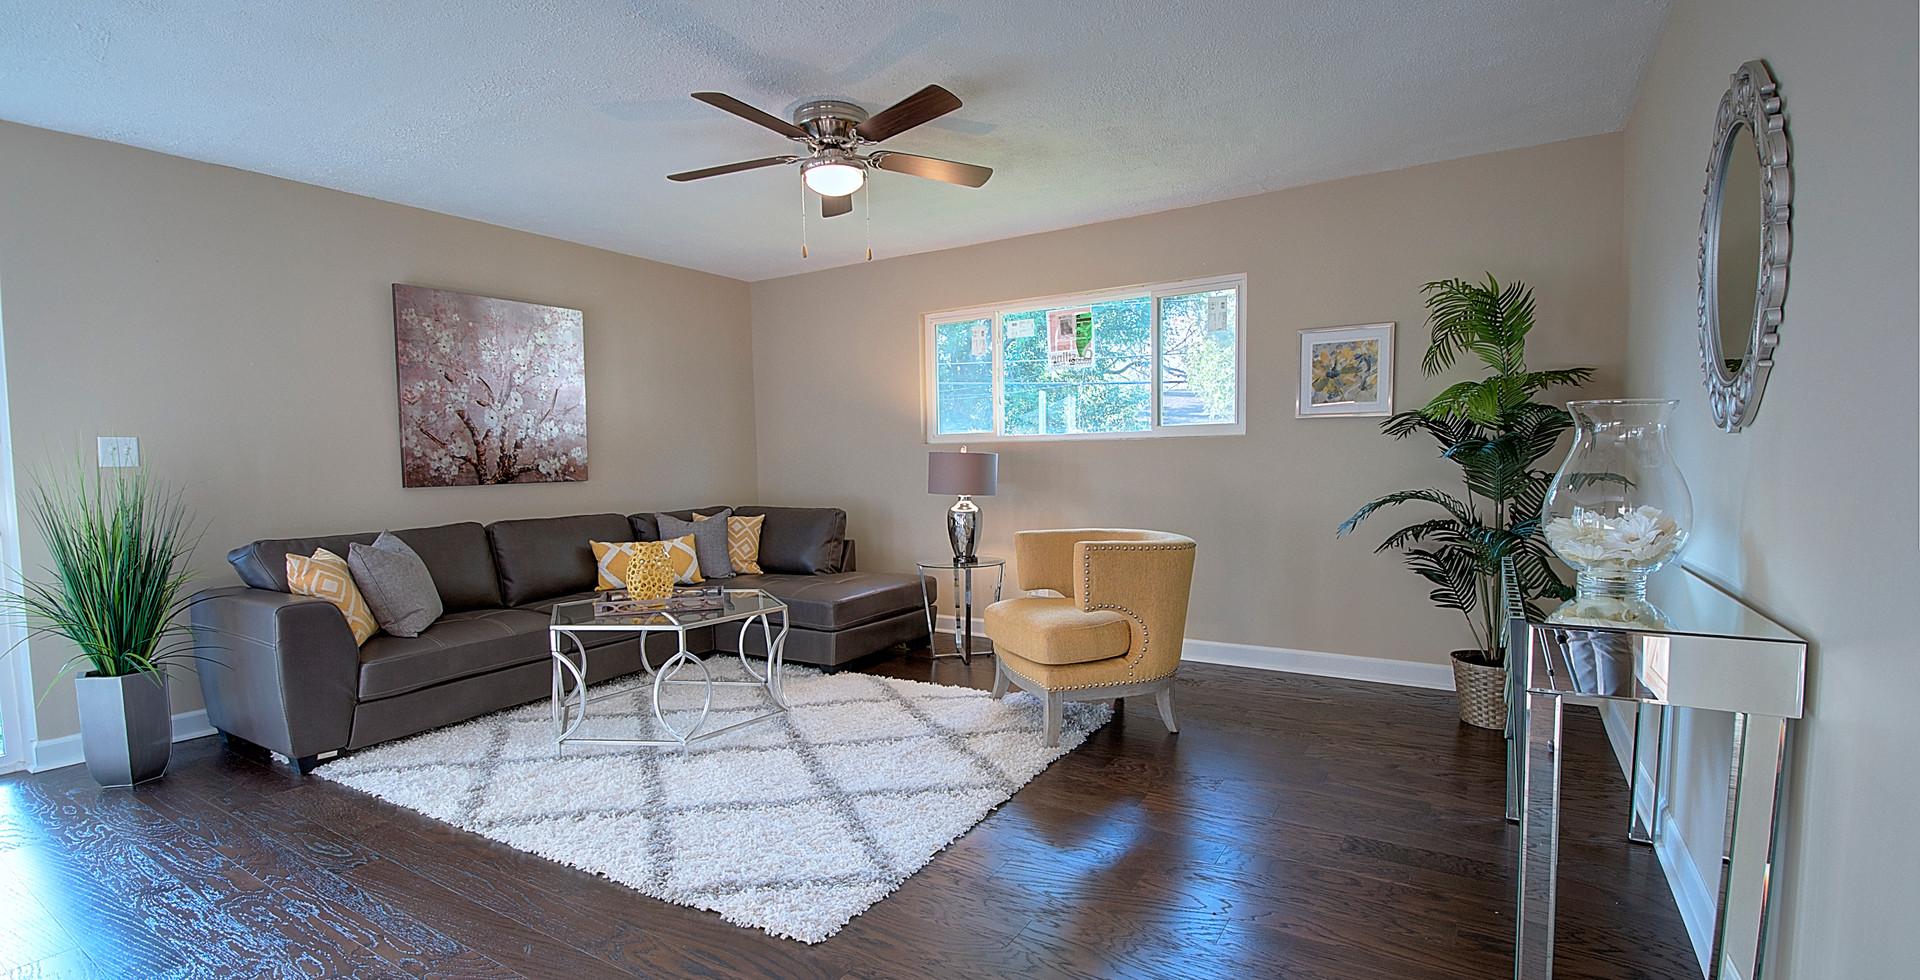 Living Room in Naperville designed by MRM Home Design.jpg